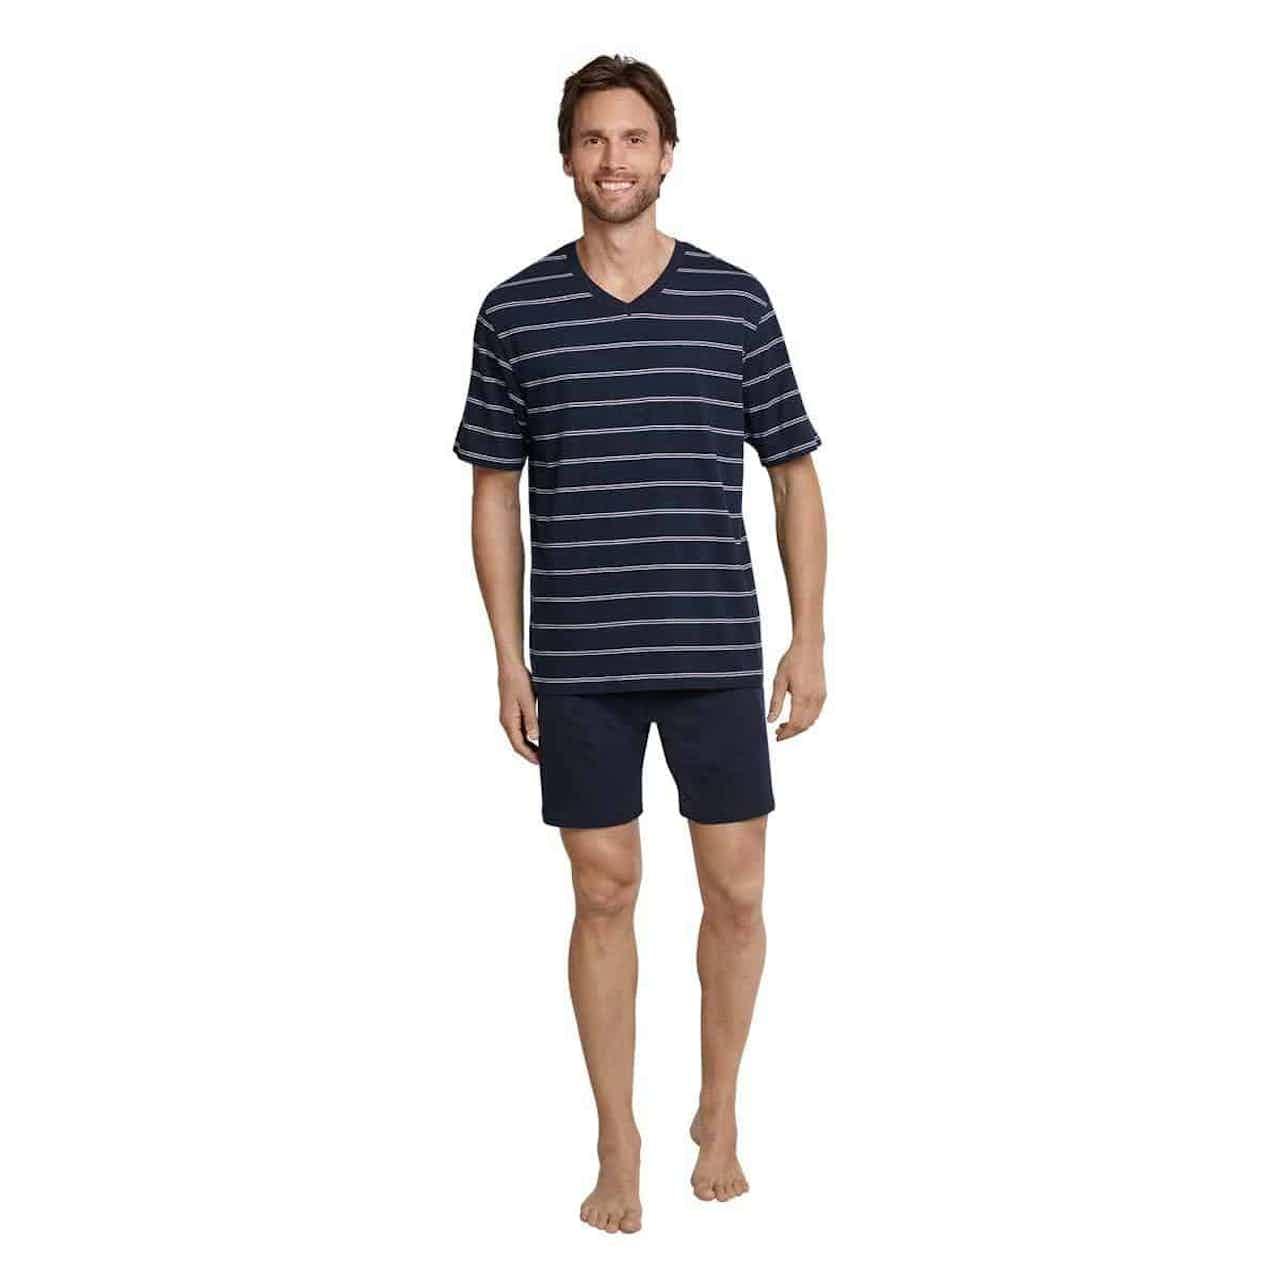 Schiesser Pyjama Herren kurz dunkelblau